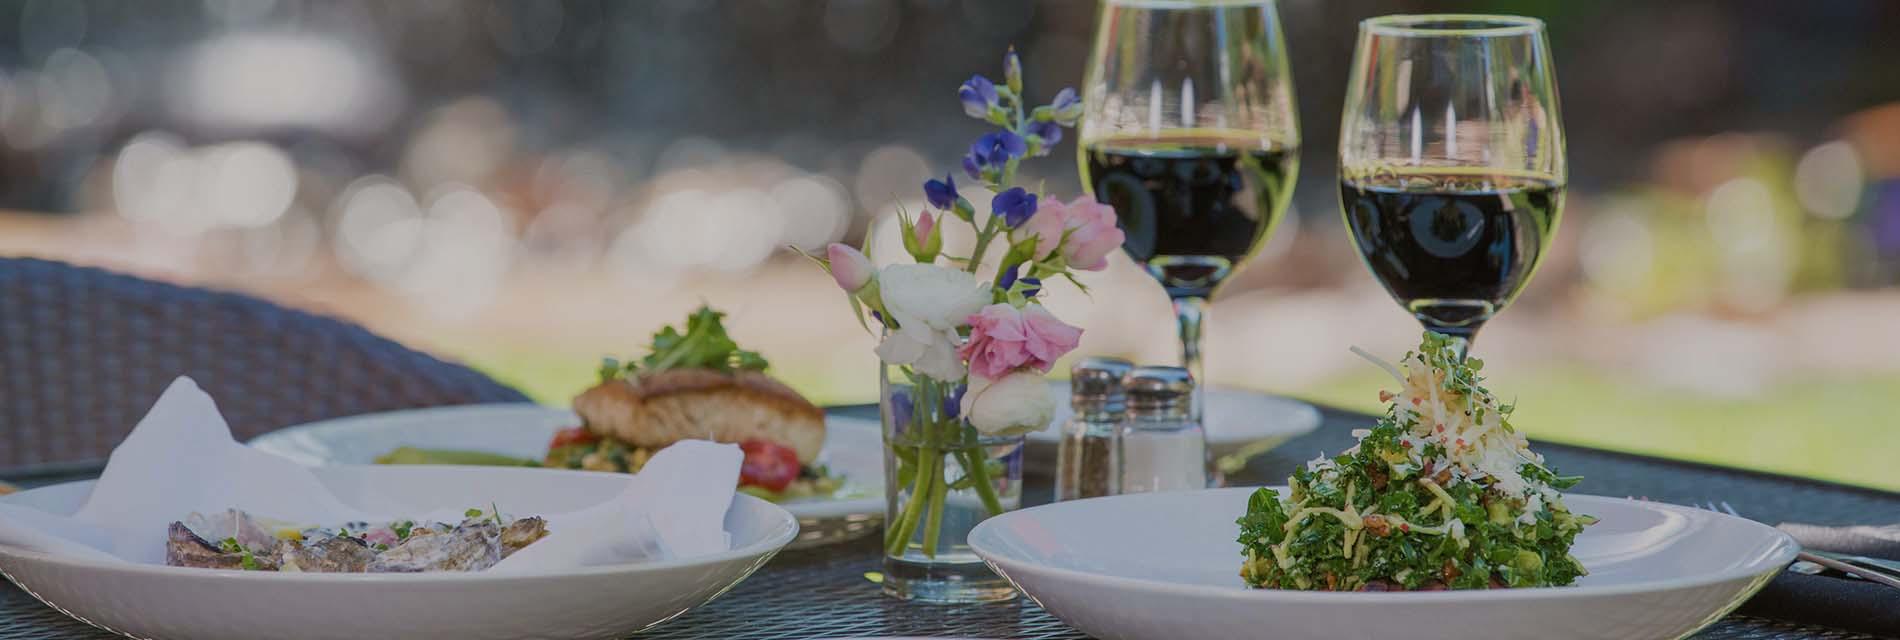 Menus   Sun Valley Hotels, Sun Valley Lodging, Knob Hill Inn